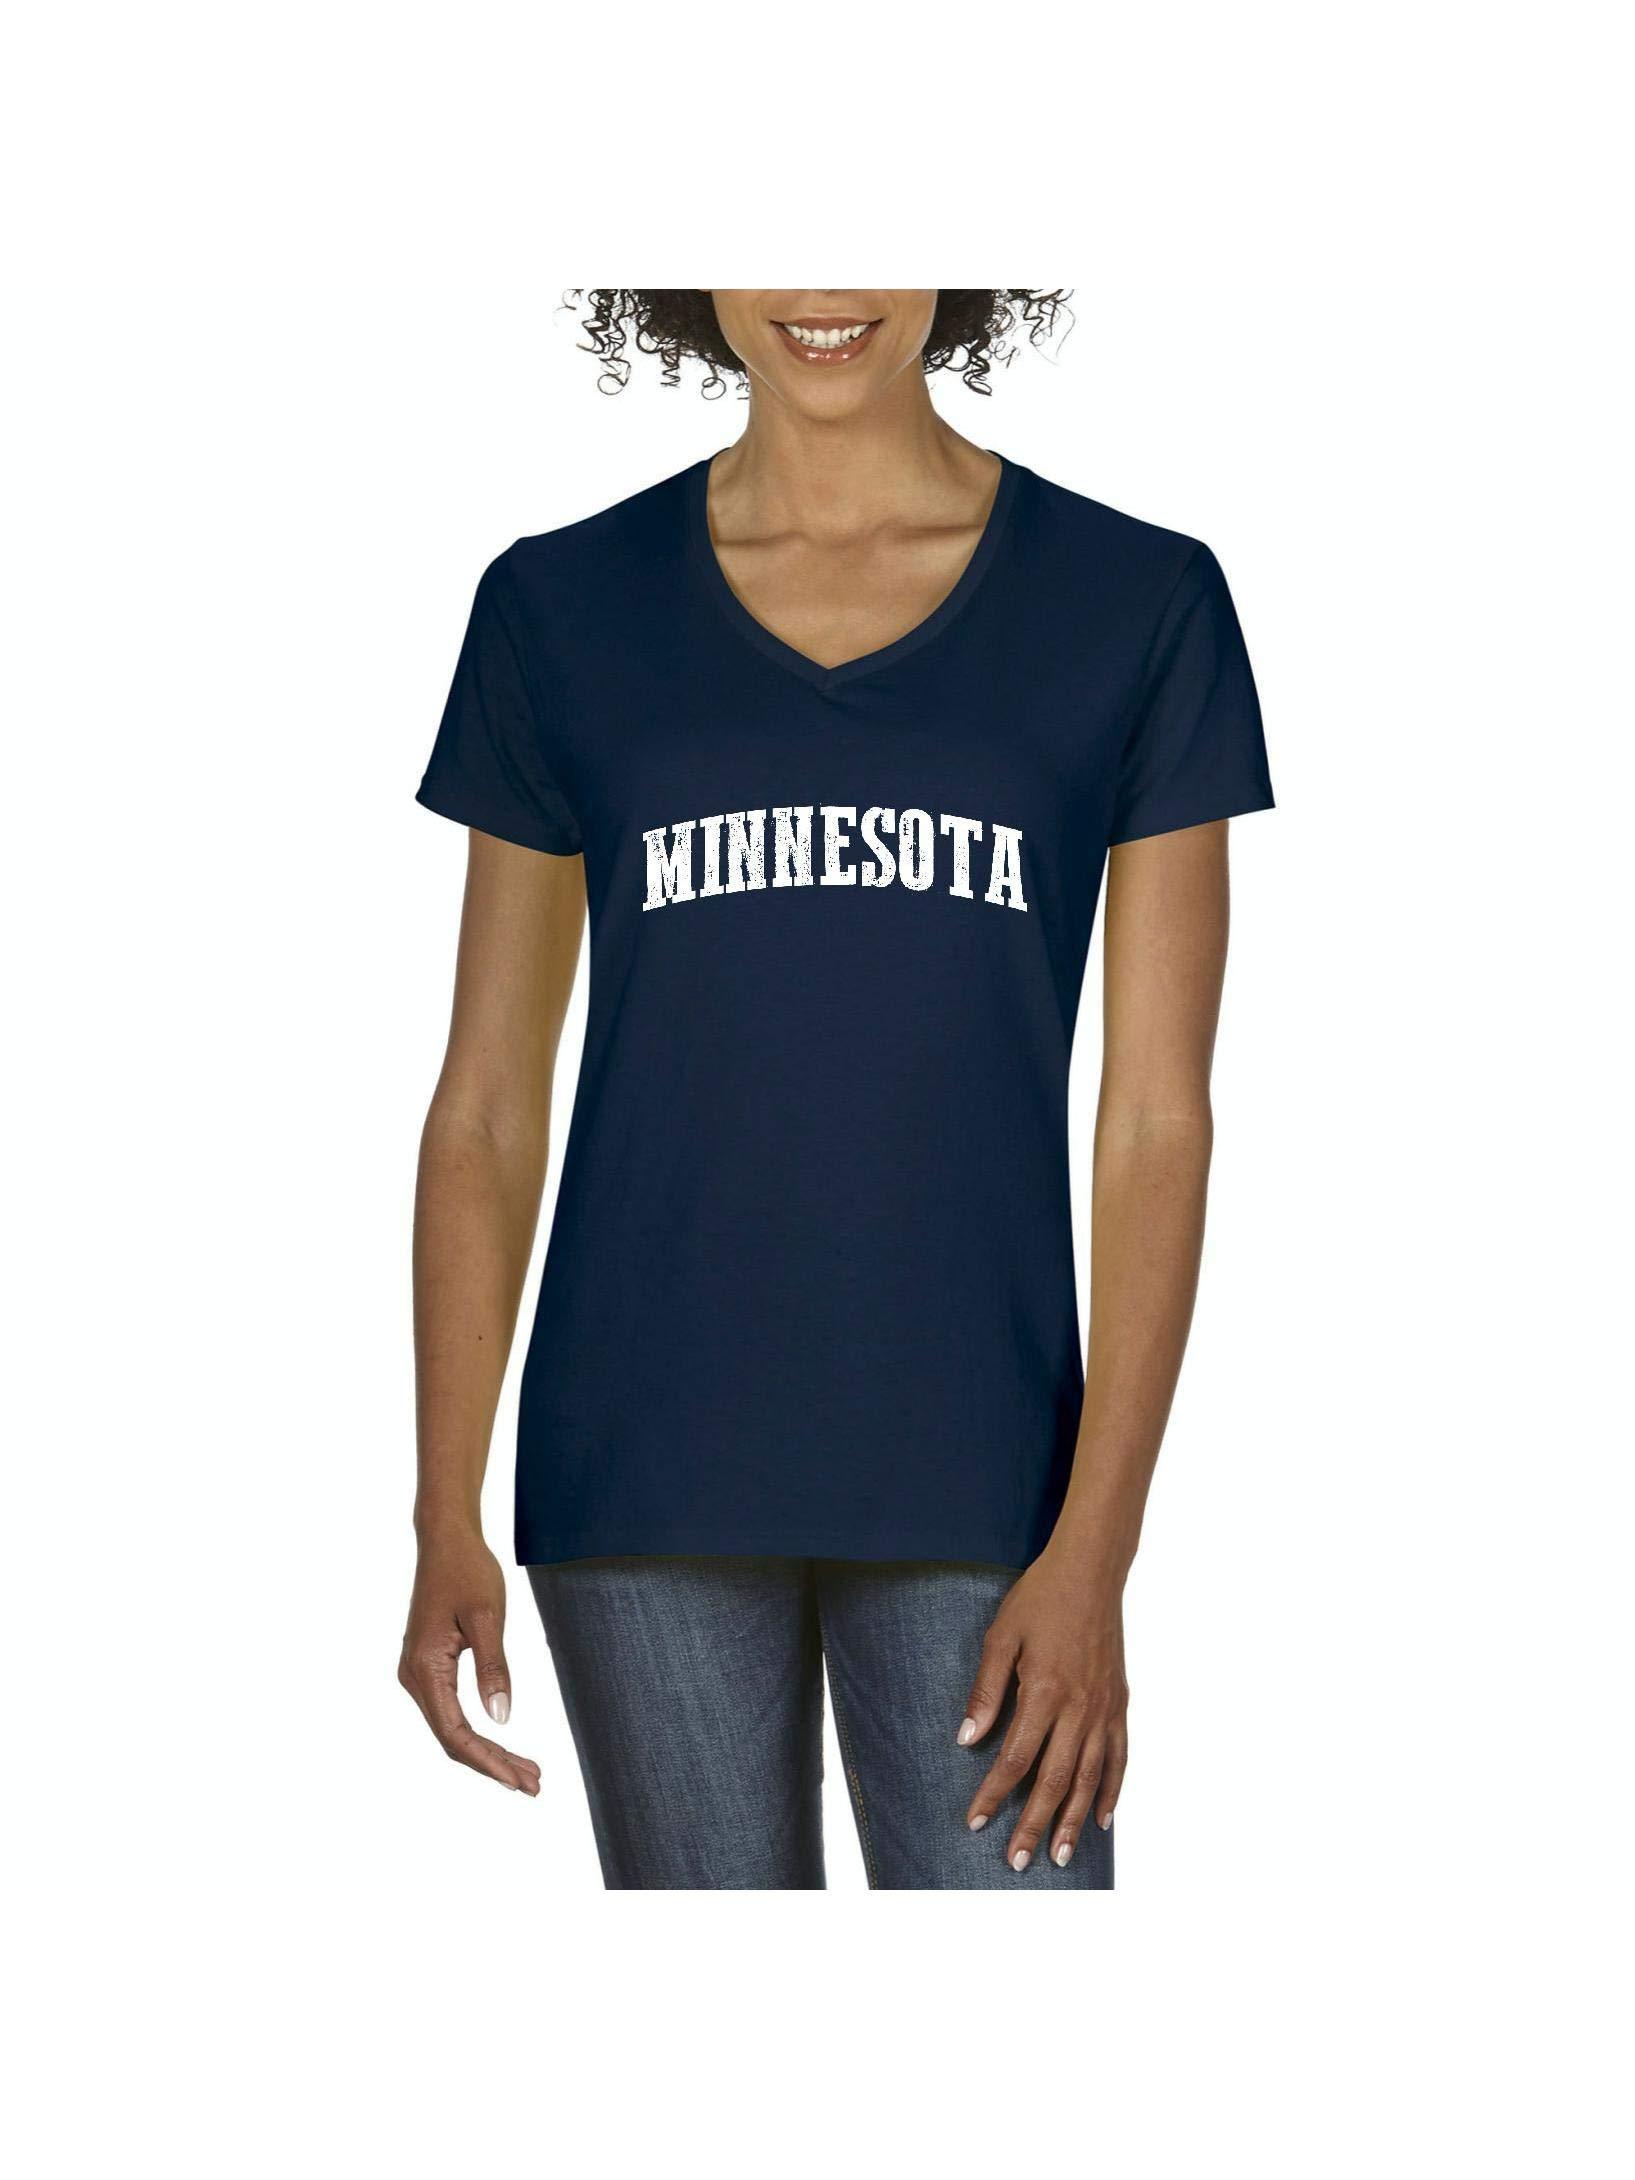 Moms Favorite Minnesota State Flag Travelers Gift Vneck Tshirt Tee